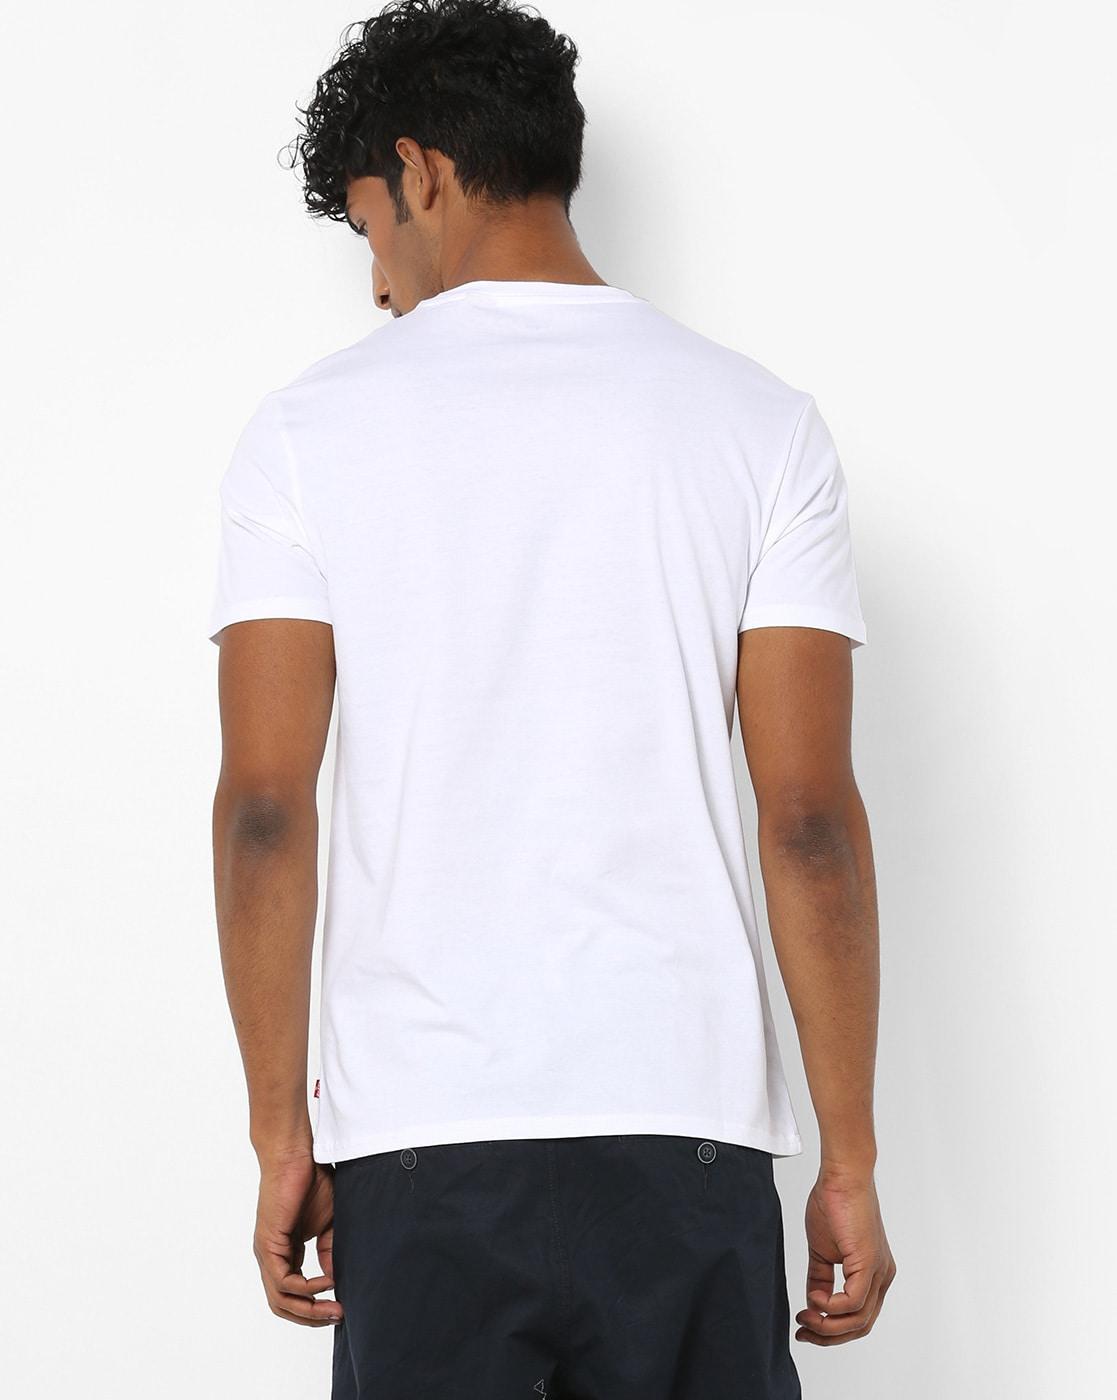 2ffd5f007 Buy White Tshirts for Men by LEVIS Online | Ajio.com